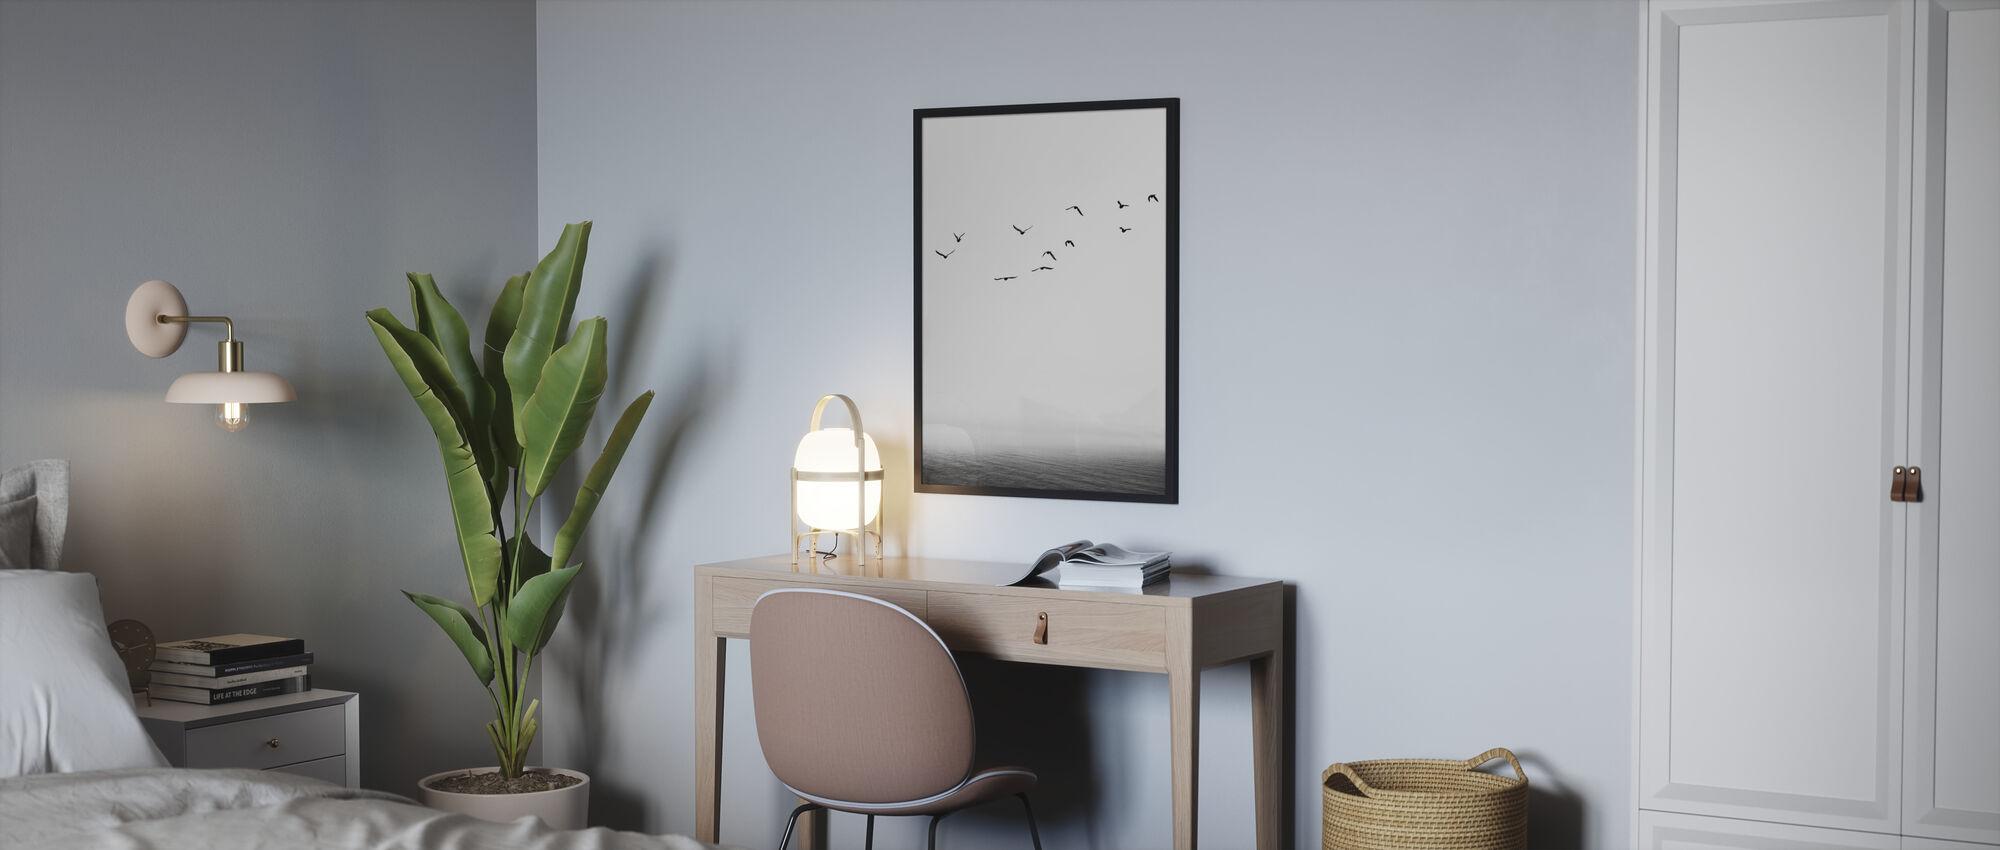 Seaside - Poster - Bedroom